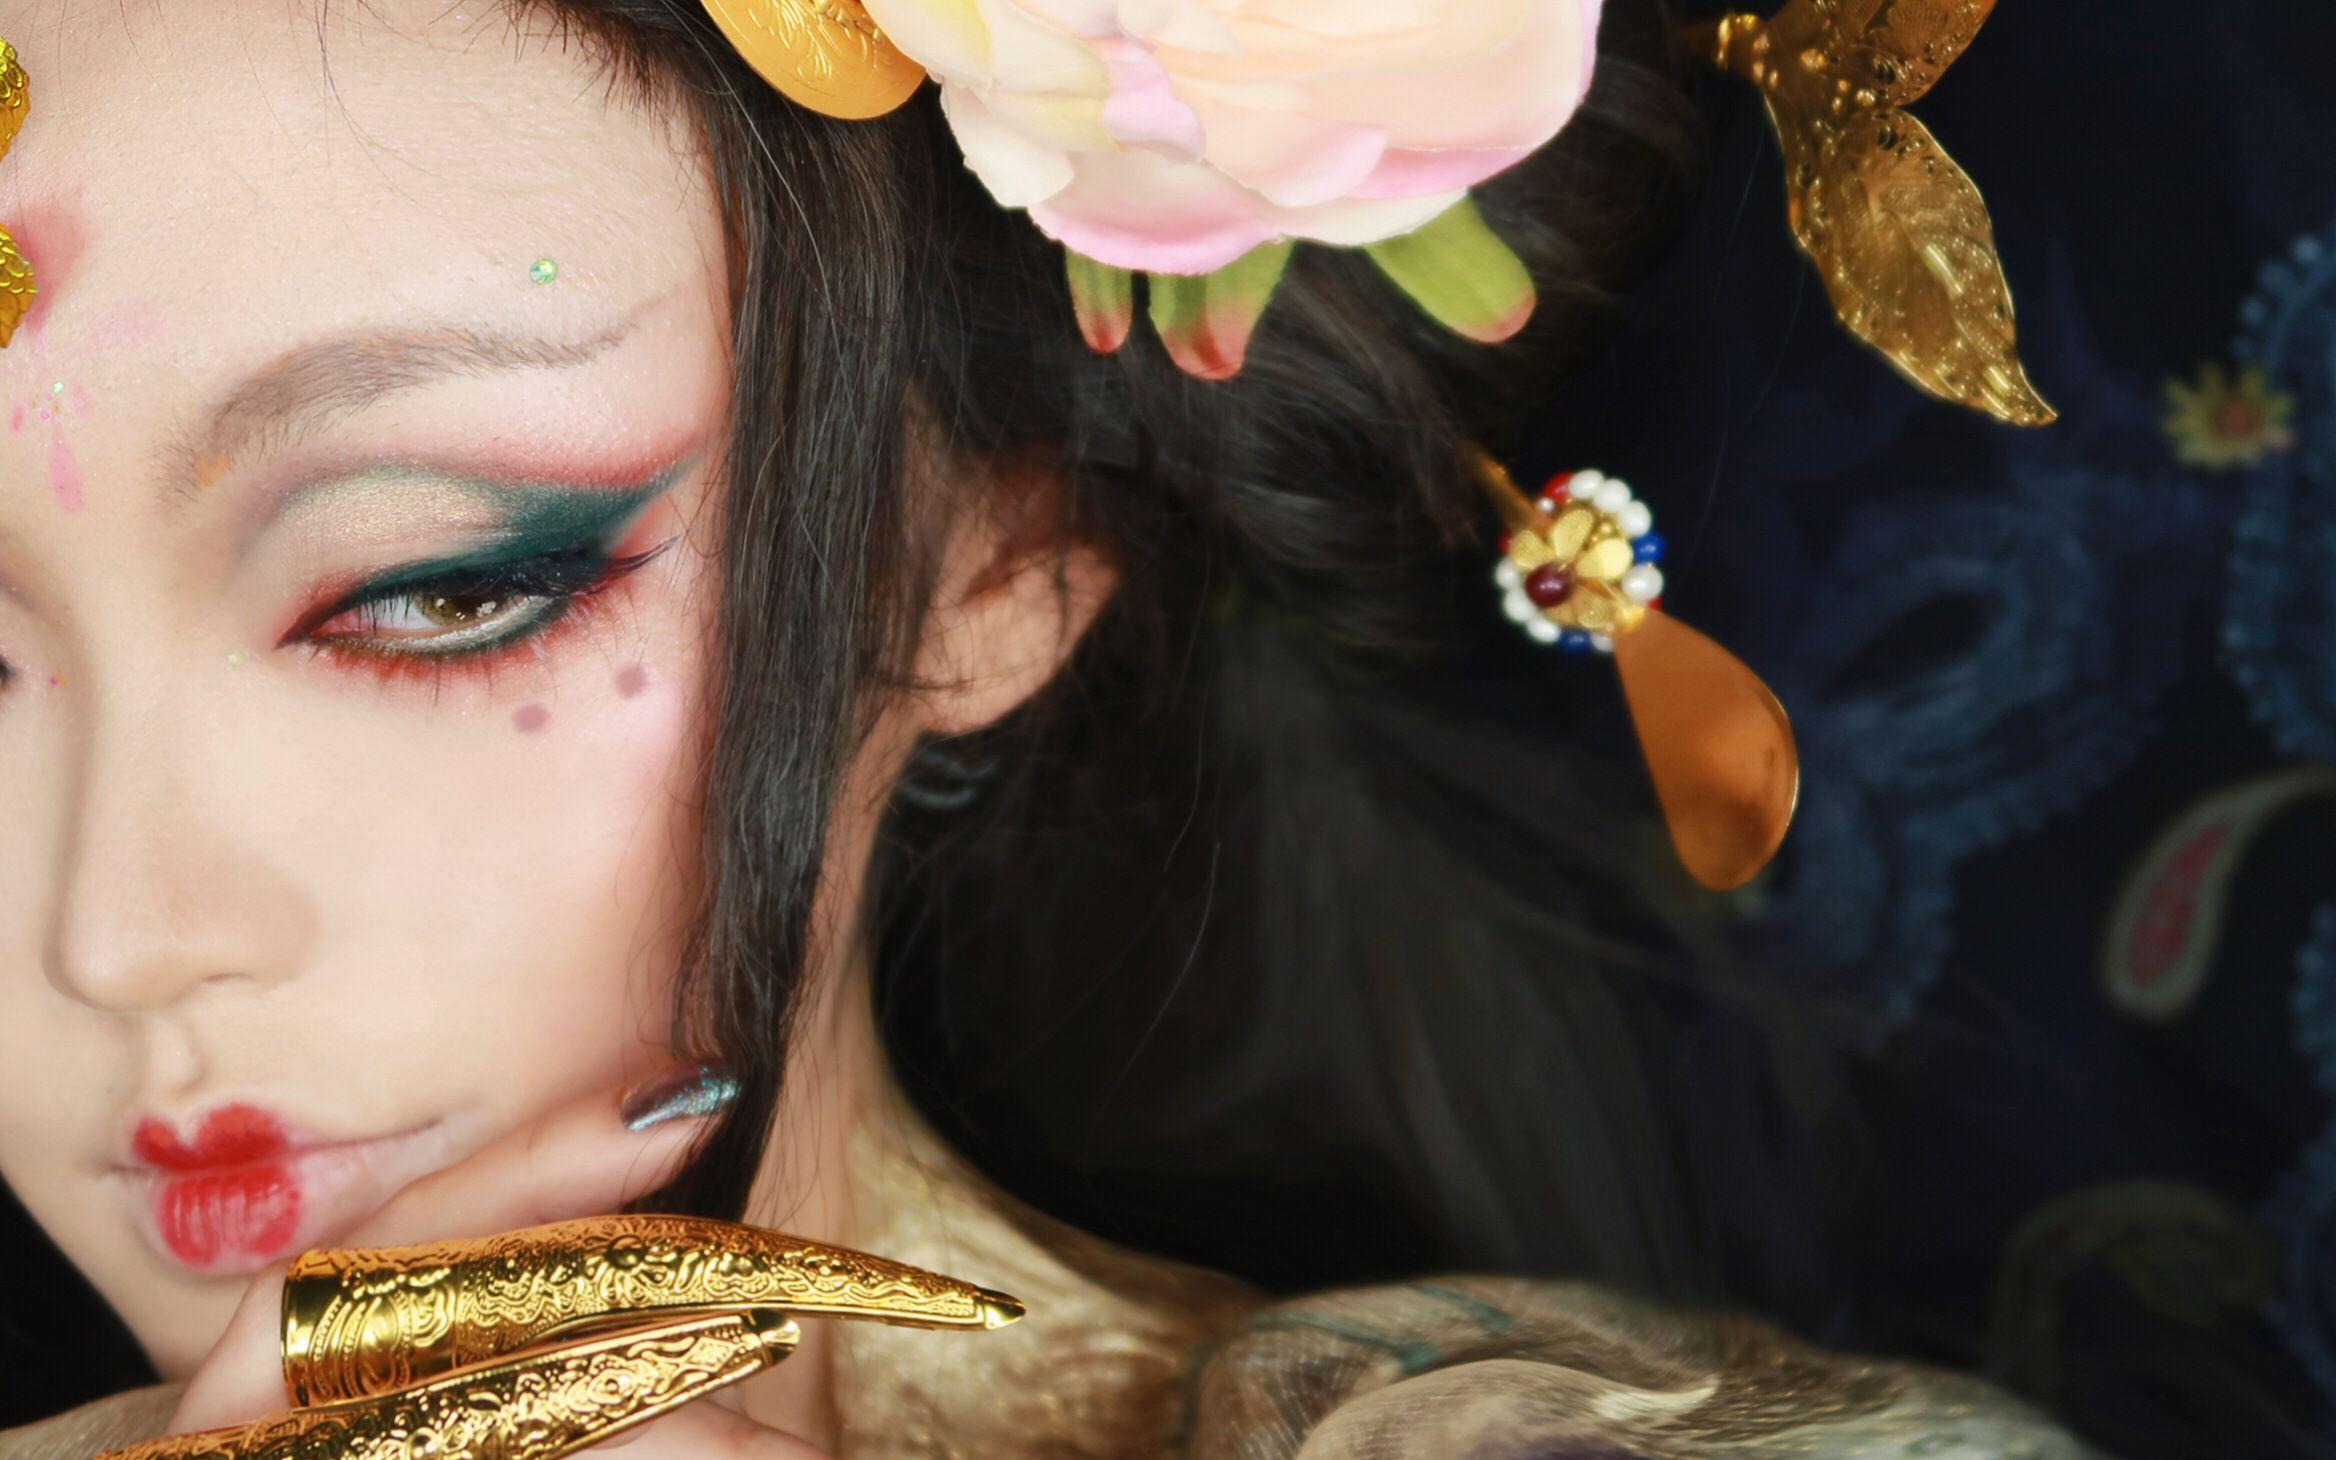 【Kylin柒七】四大美人杨玉环——羞花 云想衣裳花想容 春风拂槛露华浓